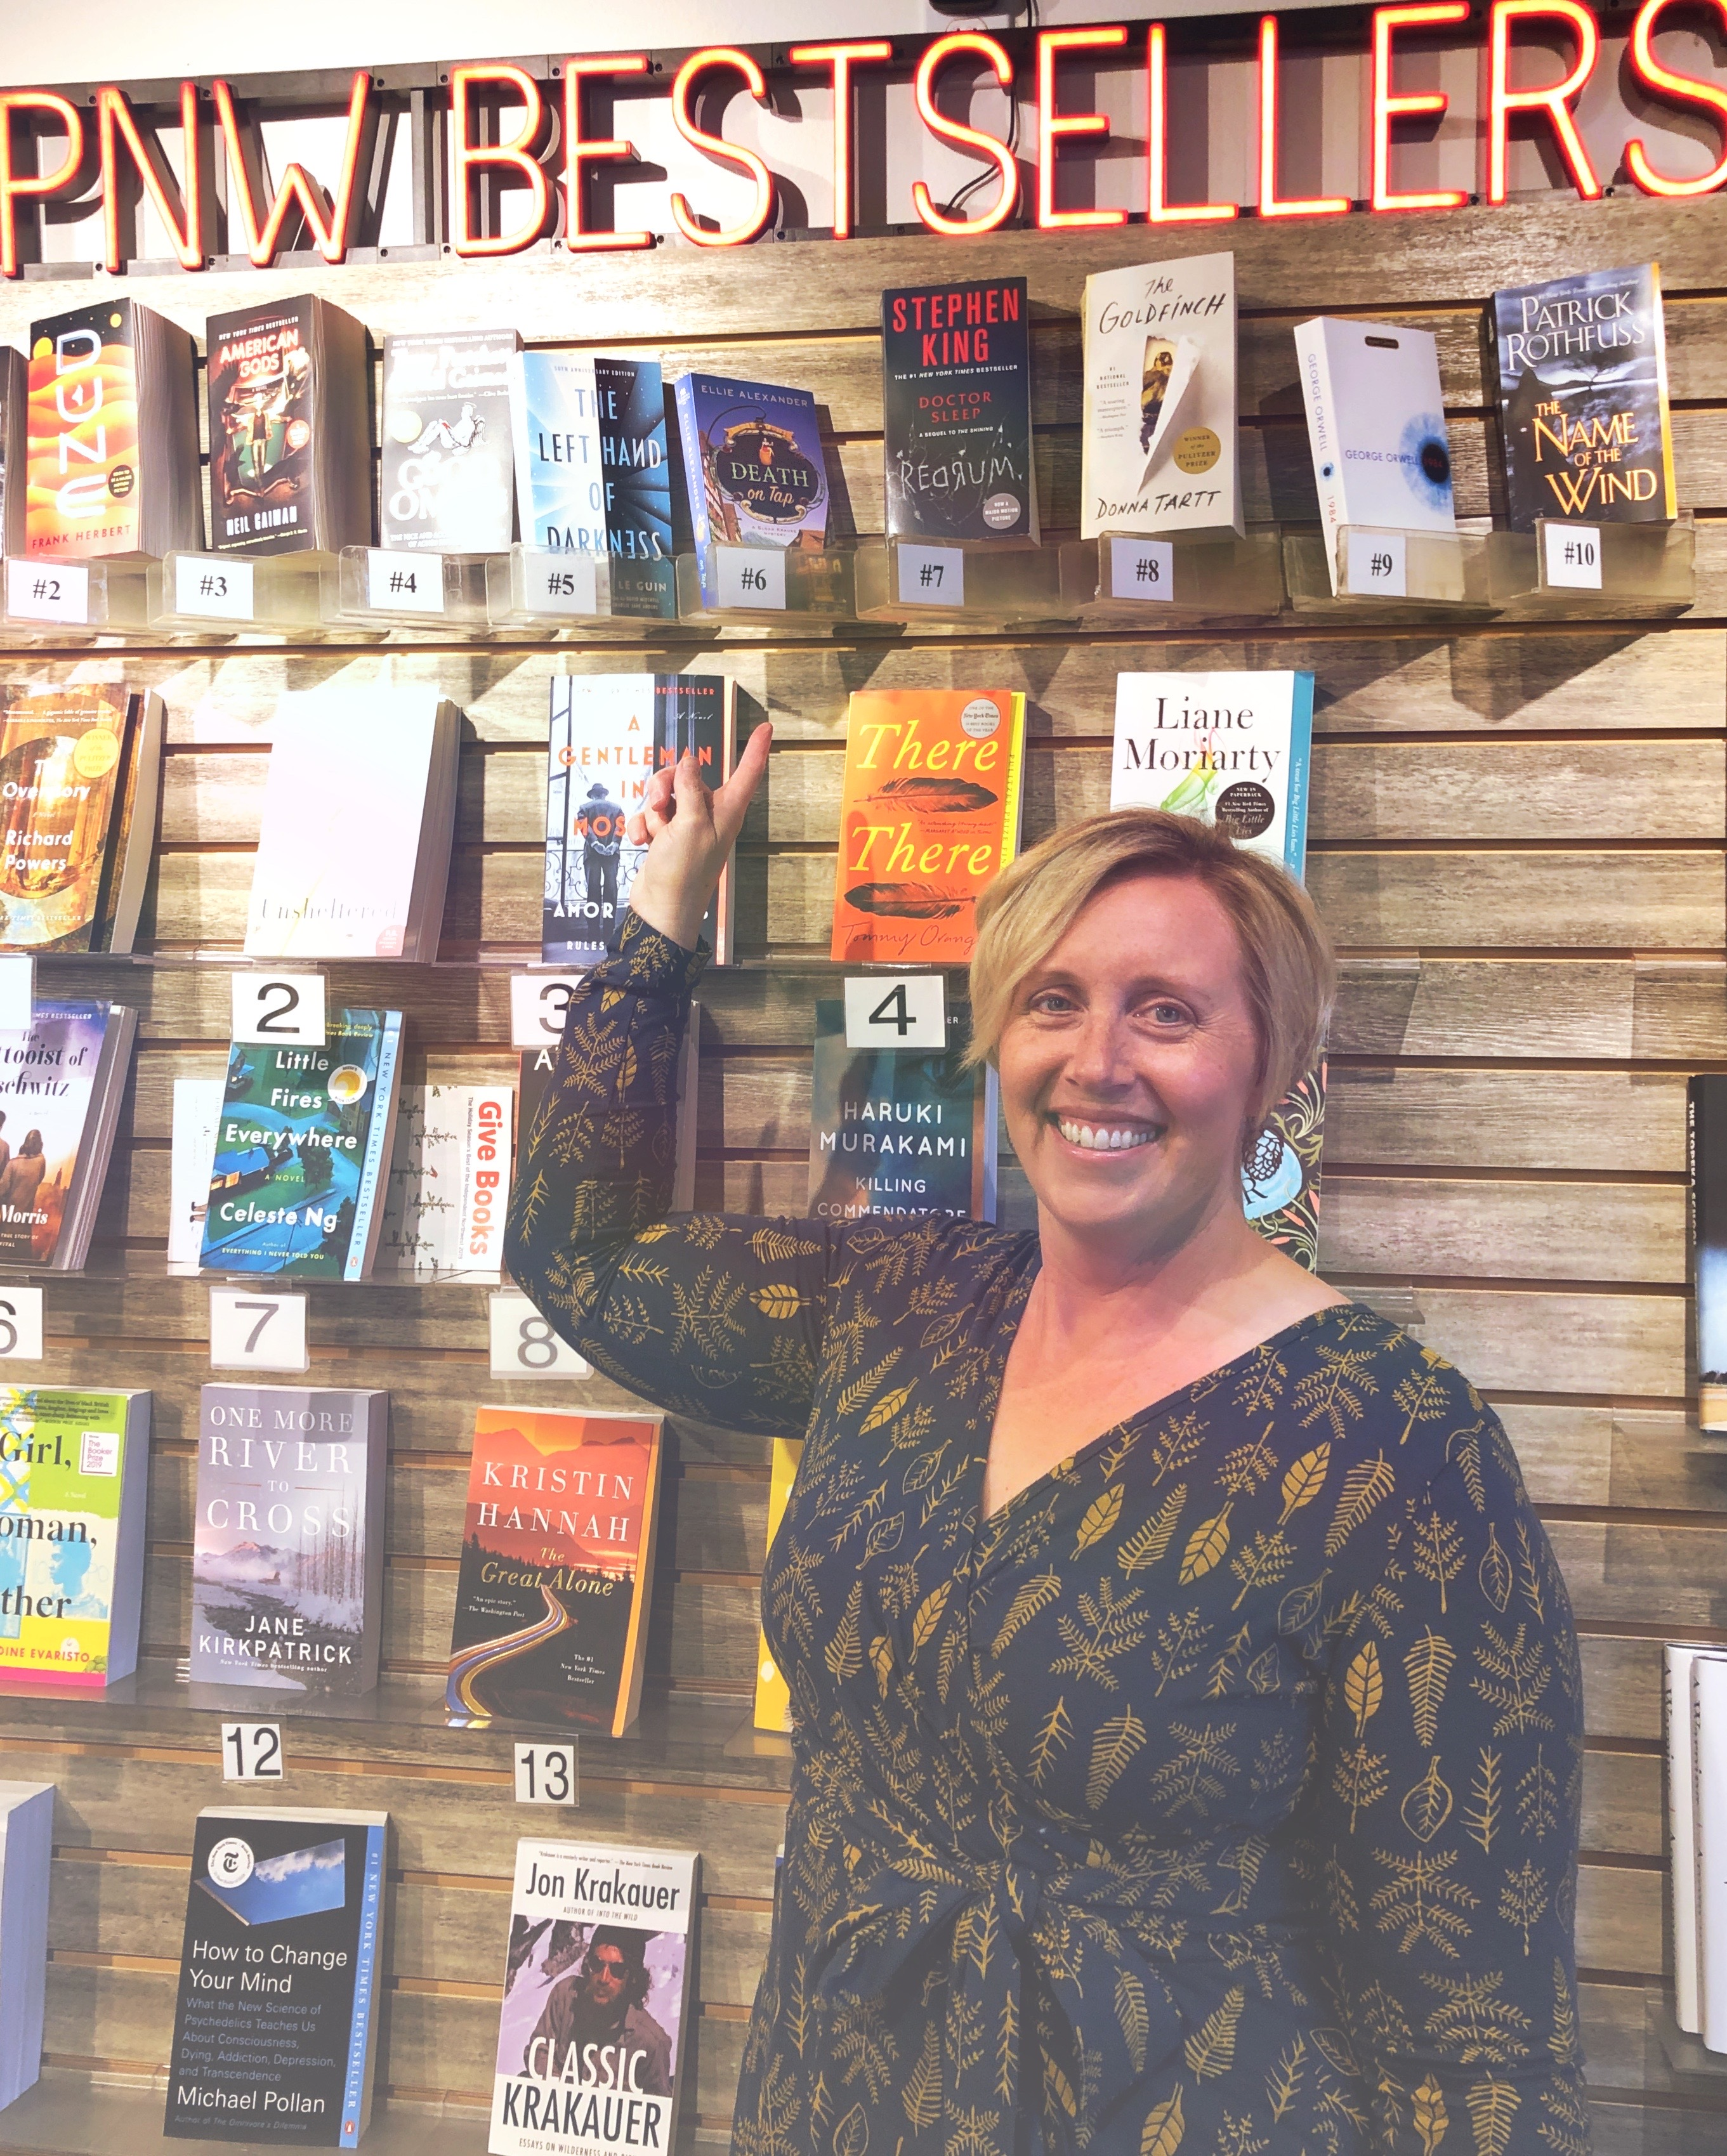 Author Ellie Alexander with PNW Bestseller Book, Death on Tap